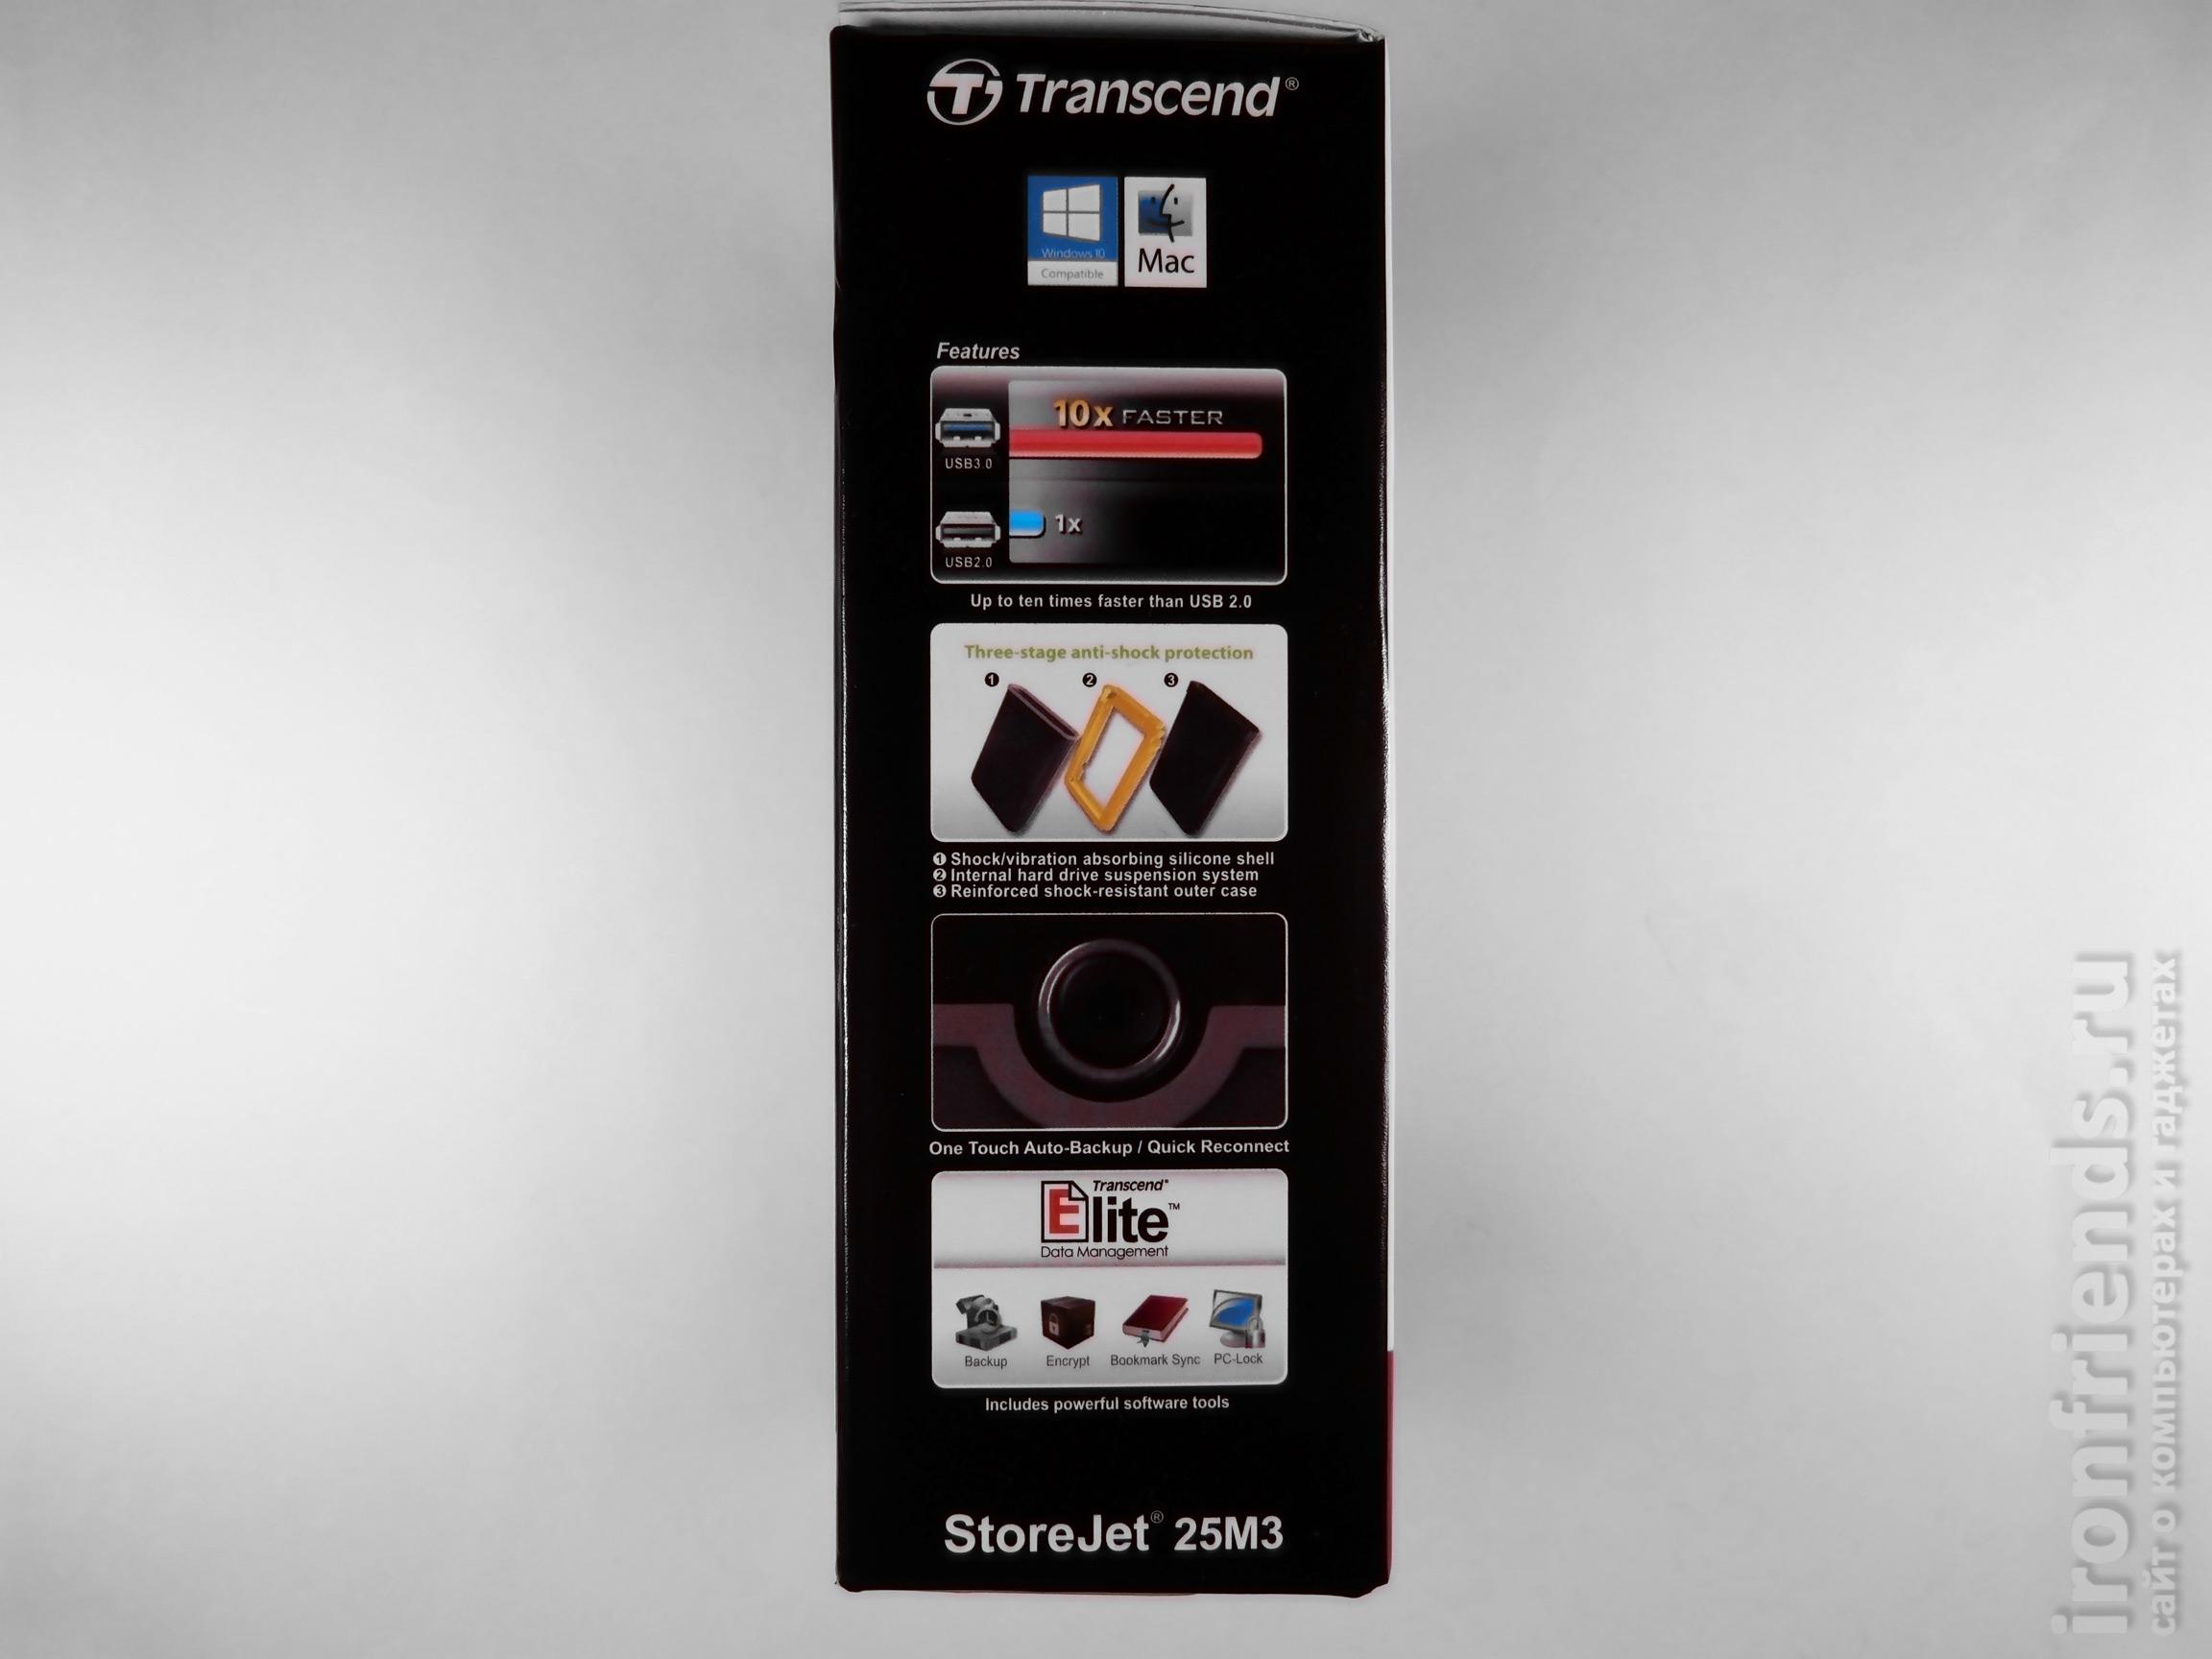 Упаковка Transcend StoreJet 25M3